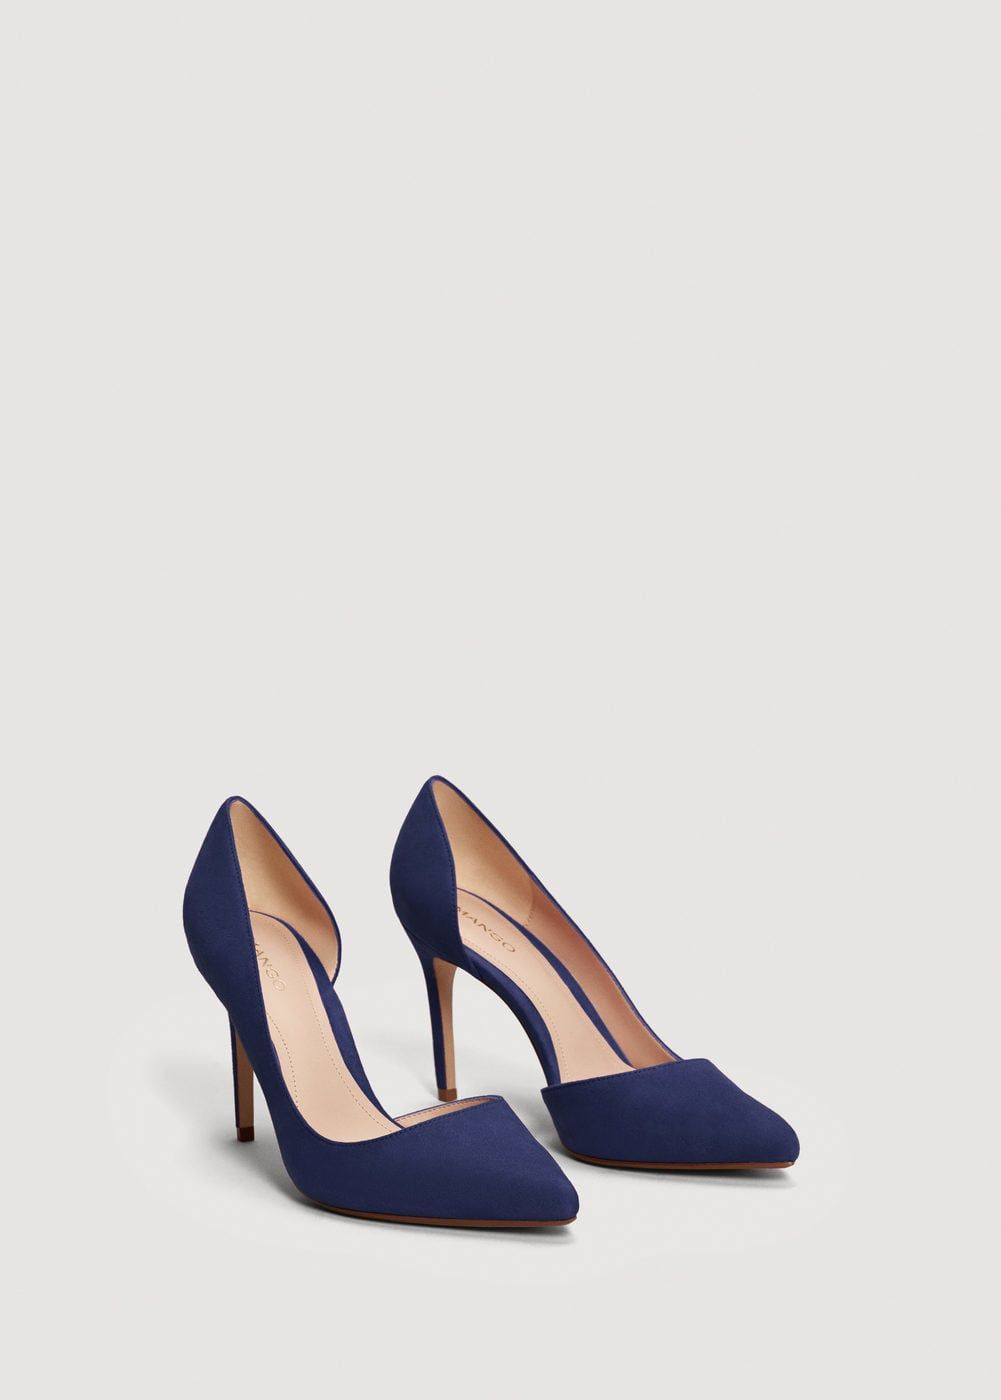 4c7e9db6481 Zapato salón asimétrico - Mujer en 2019